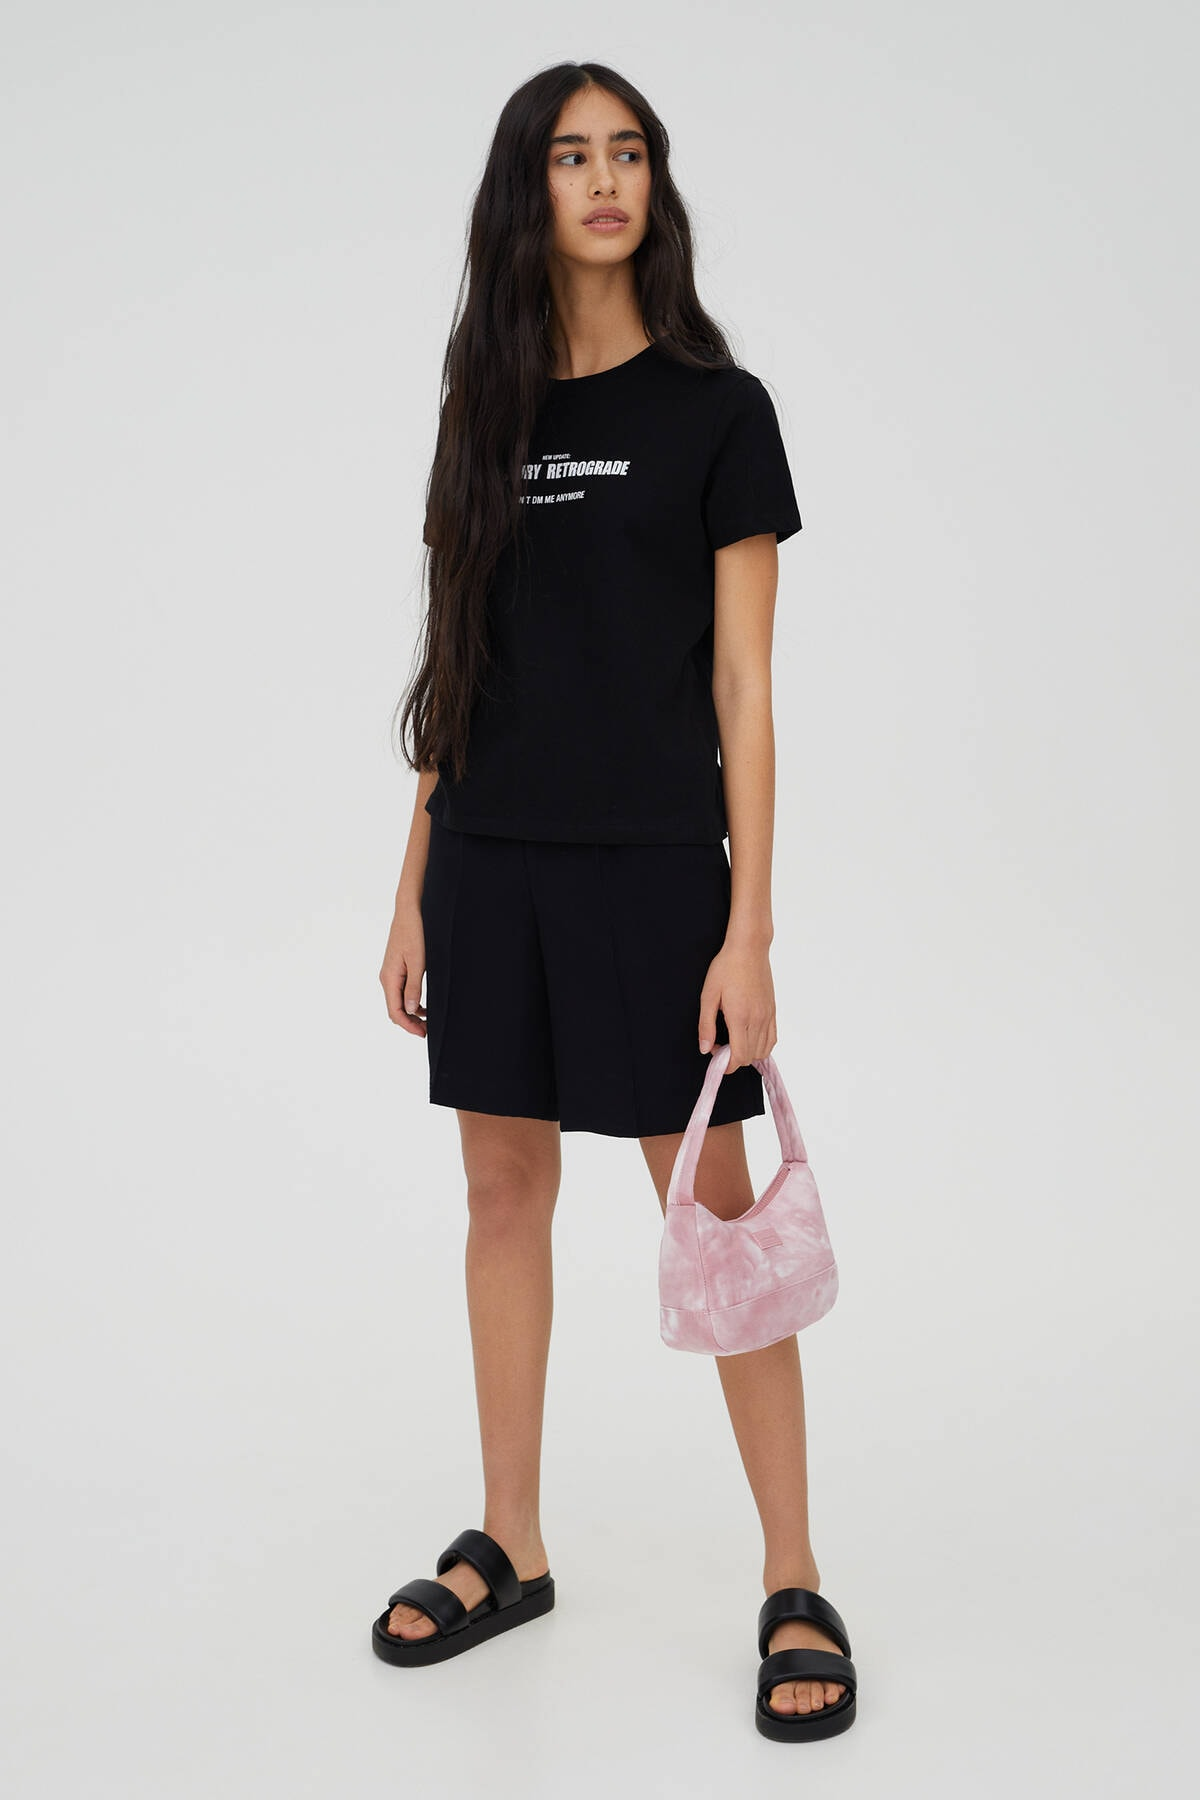 Pull & Bear Kadın Siyah Sloganlı Kısa Kollu T-Shirt 09244325 2